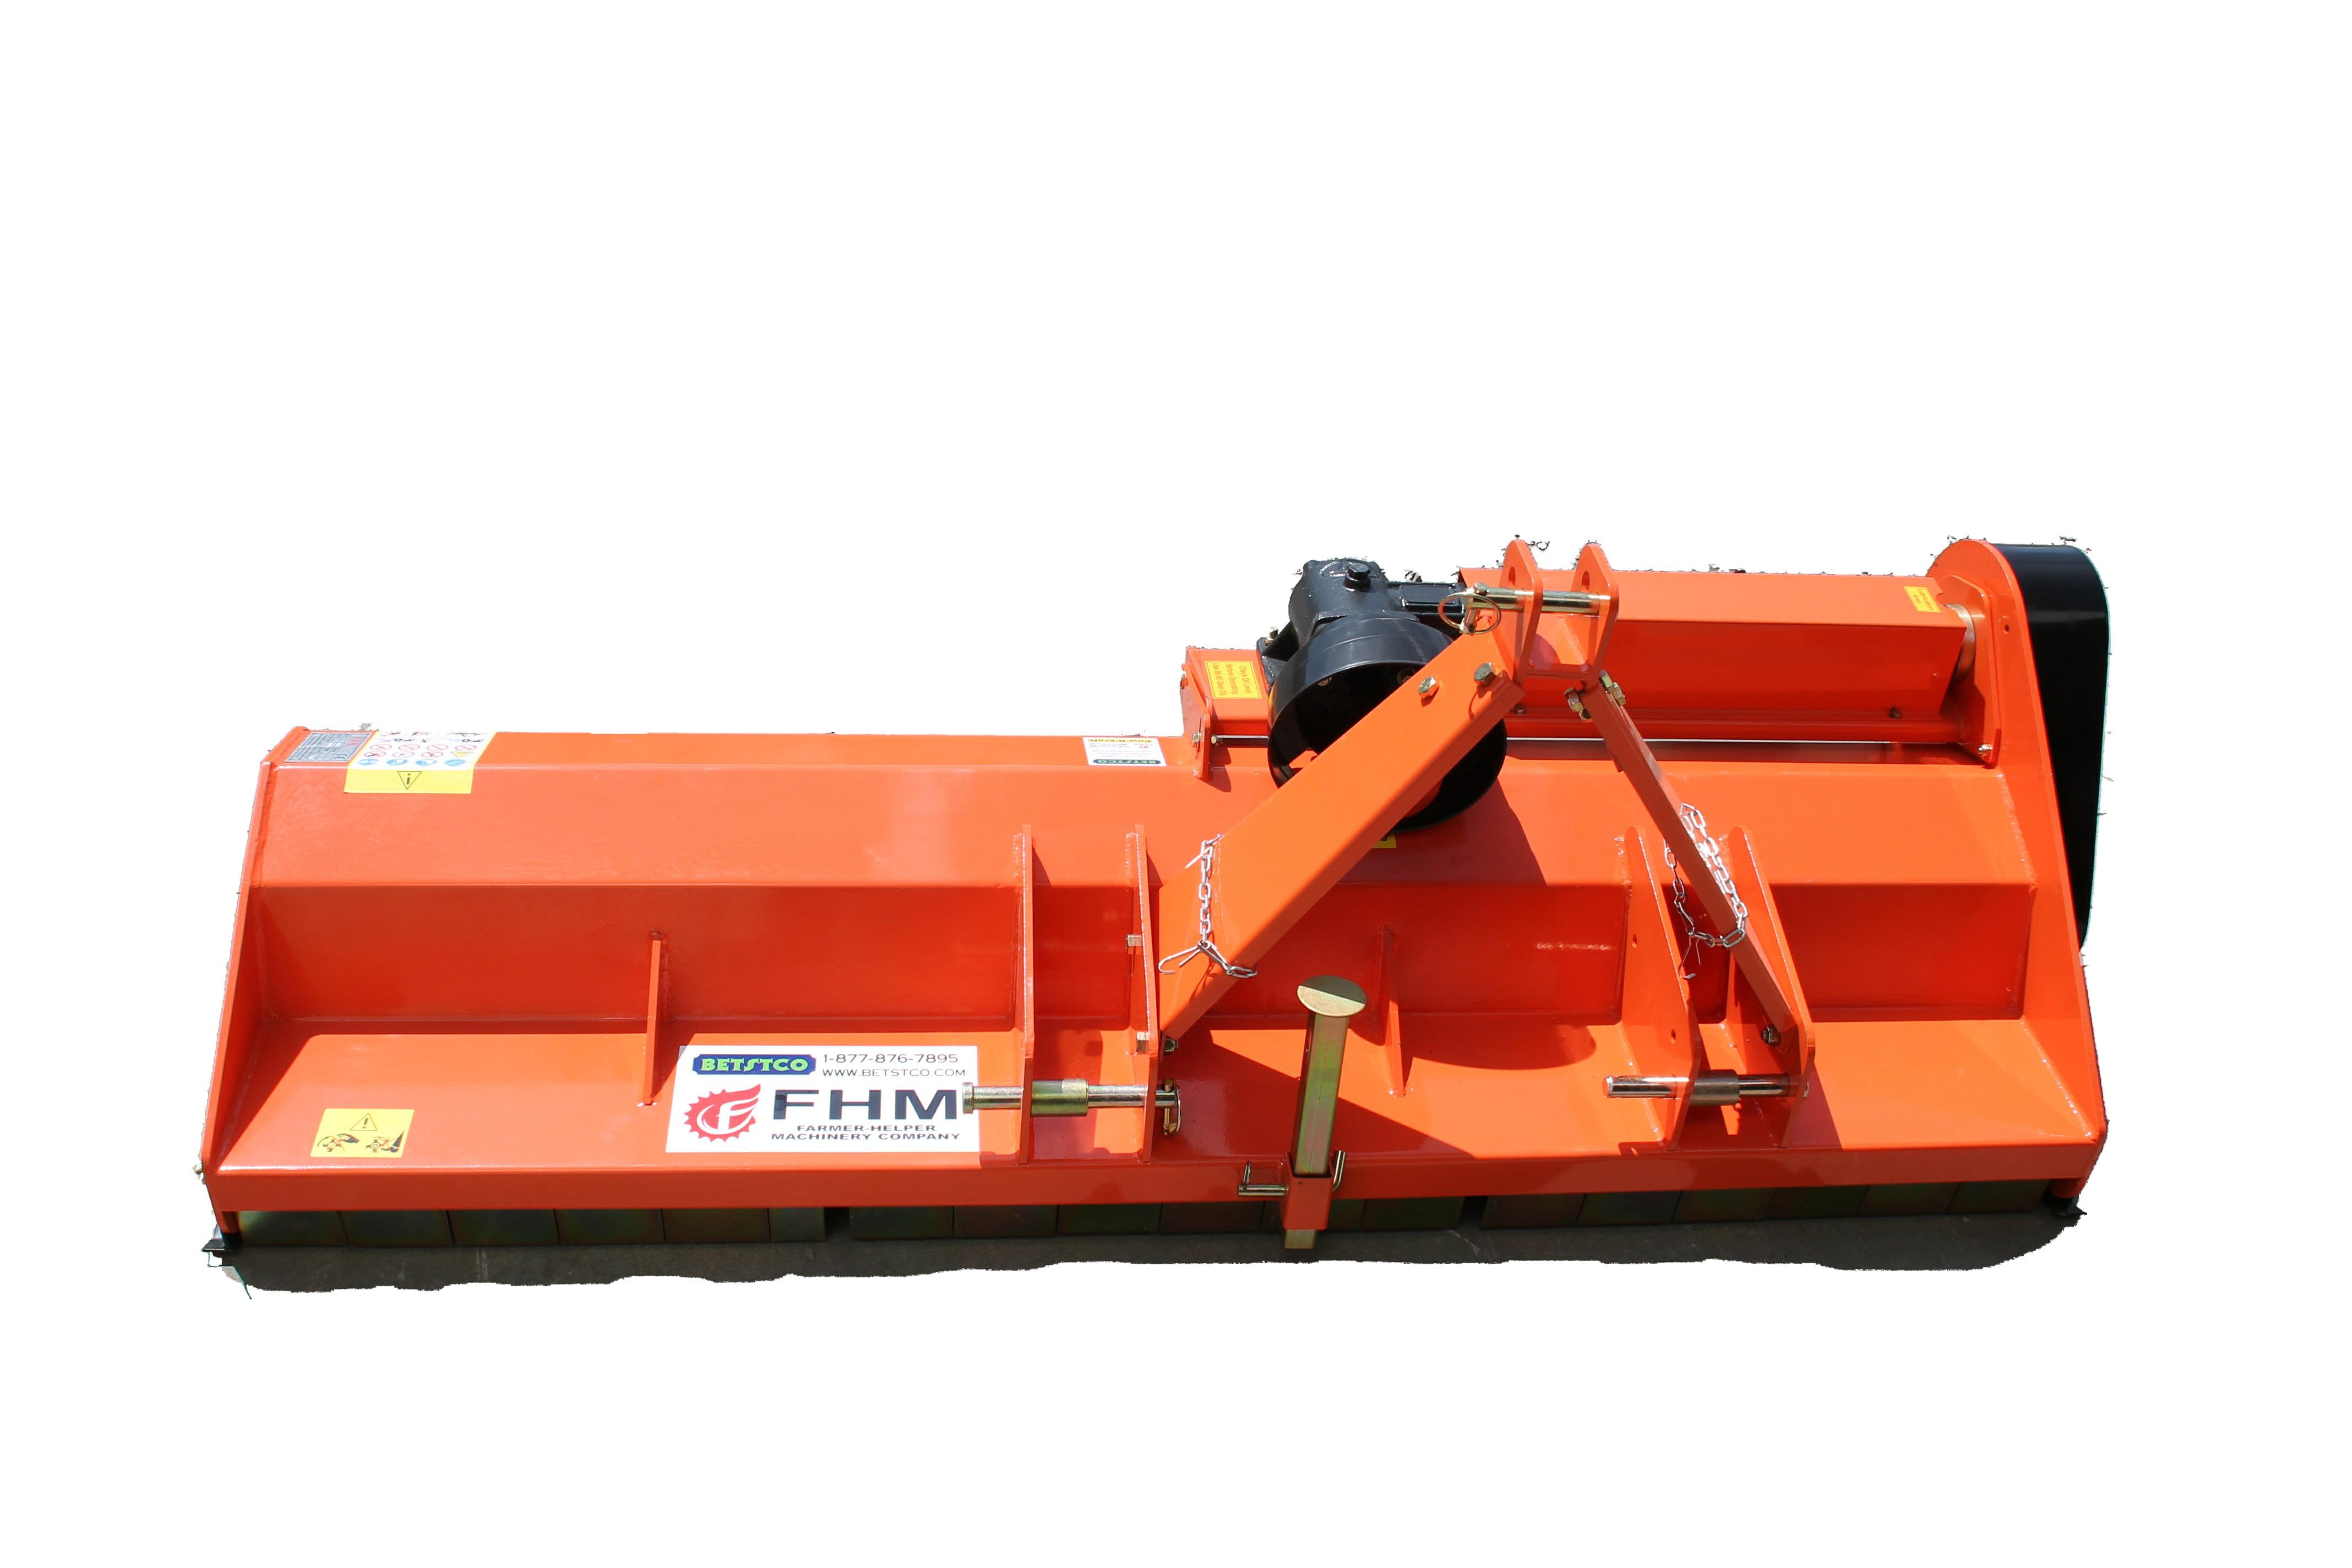 FH-EF175 Rating Farmer Helper 60 Field Flail Mower Cat.I 3pt 28HP